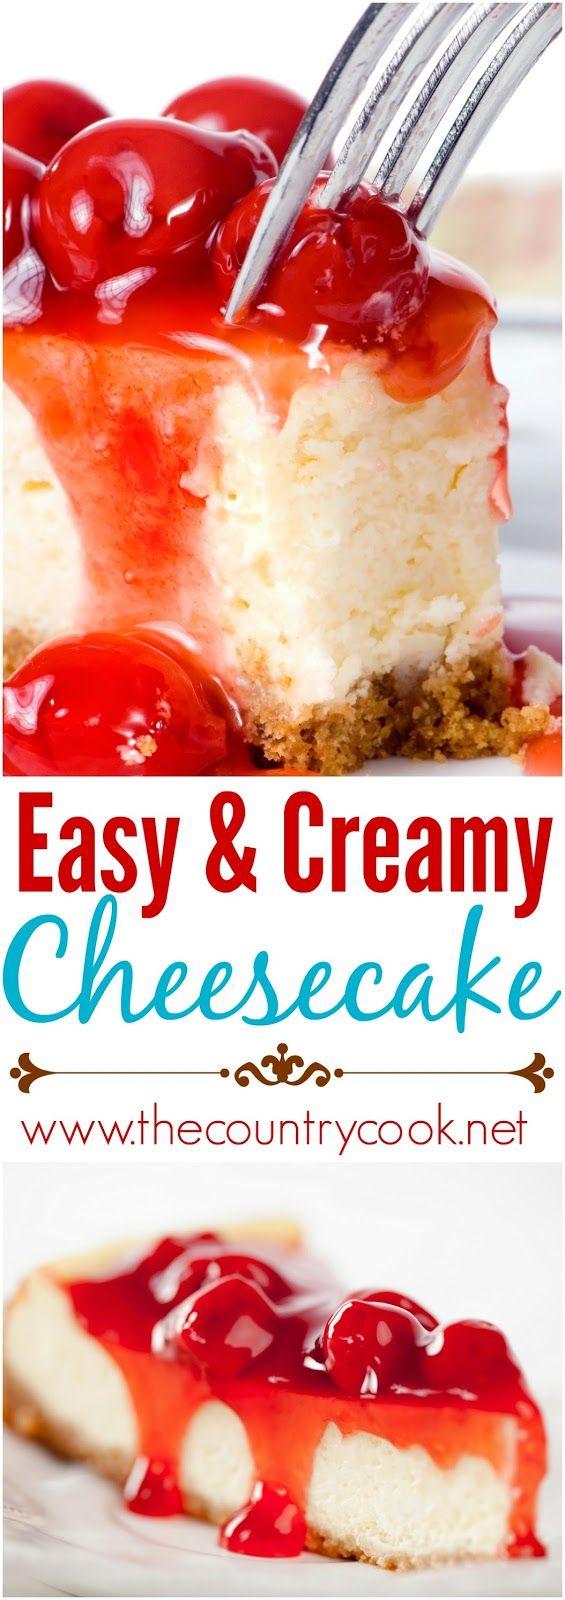 Easy and Creamy Cheesecake #cheesecake